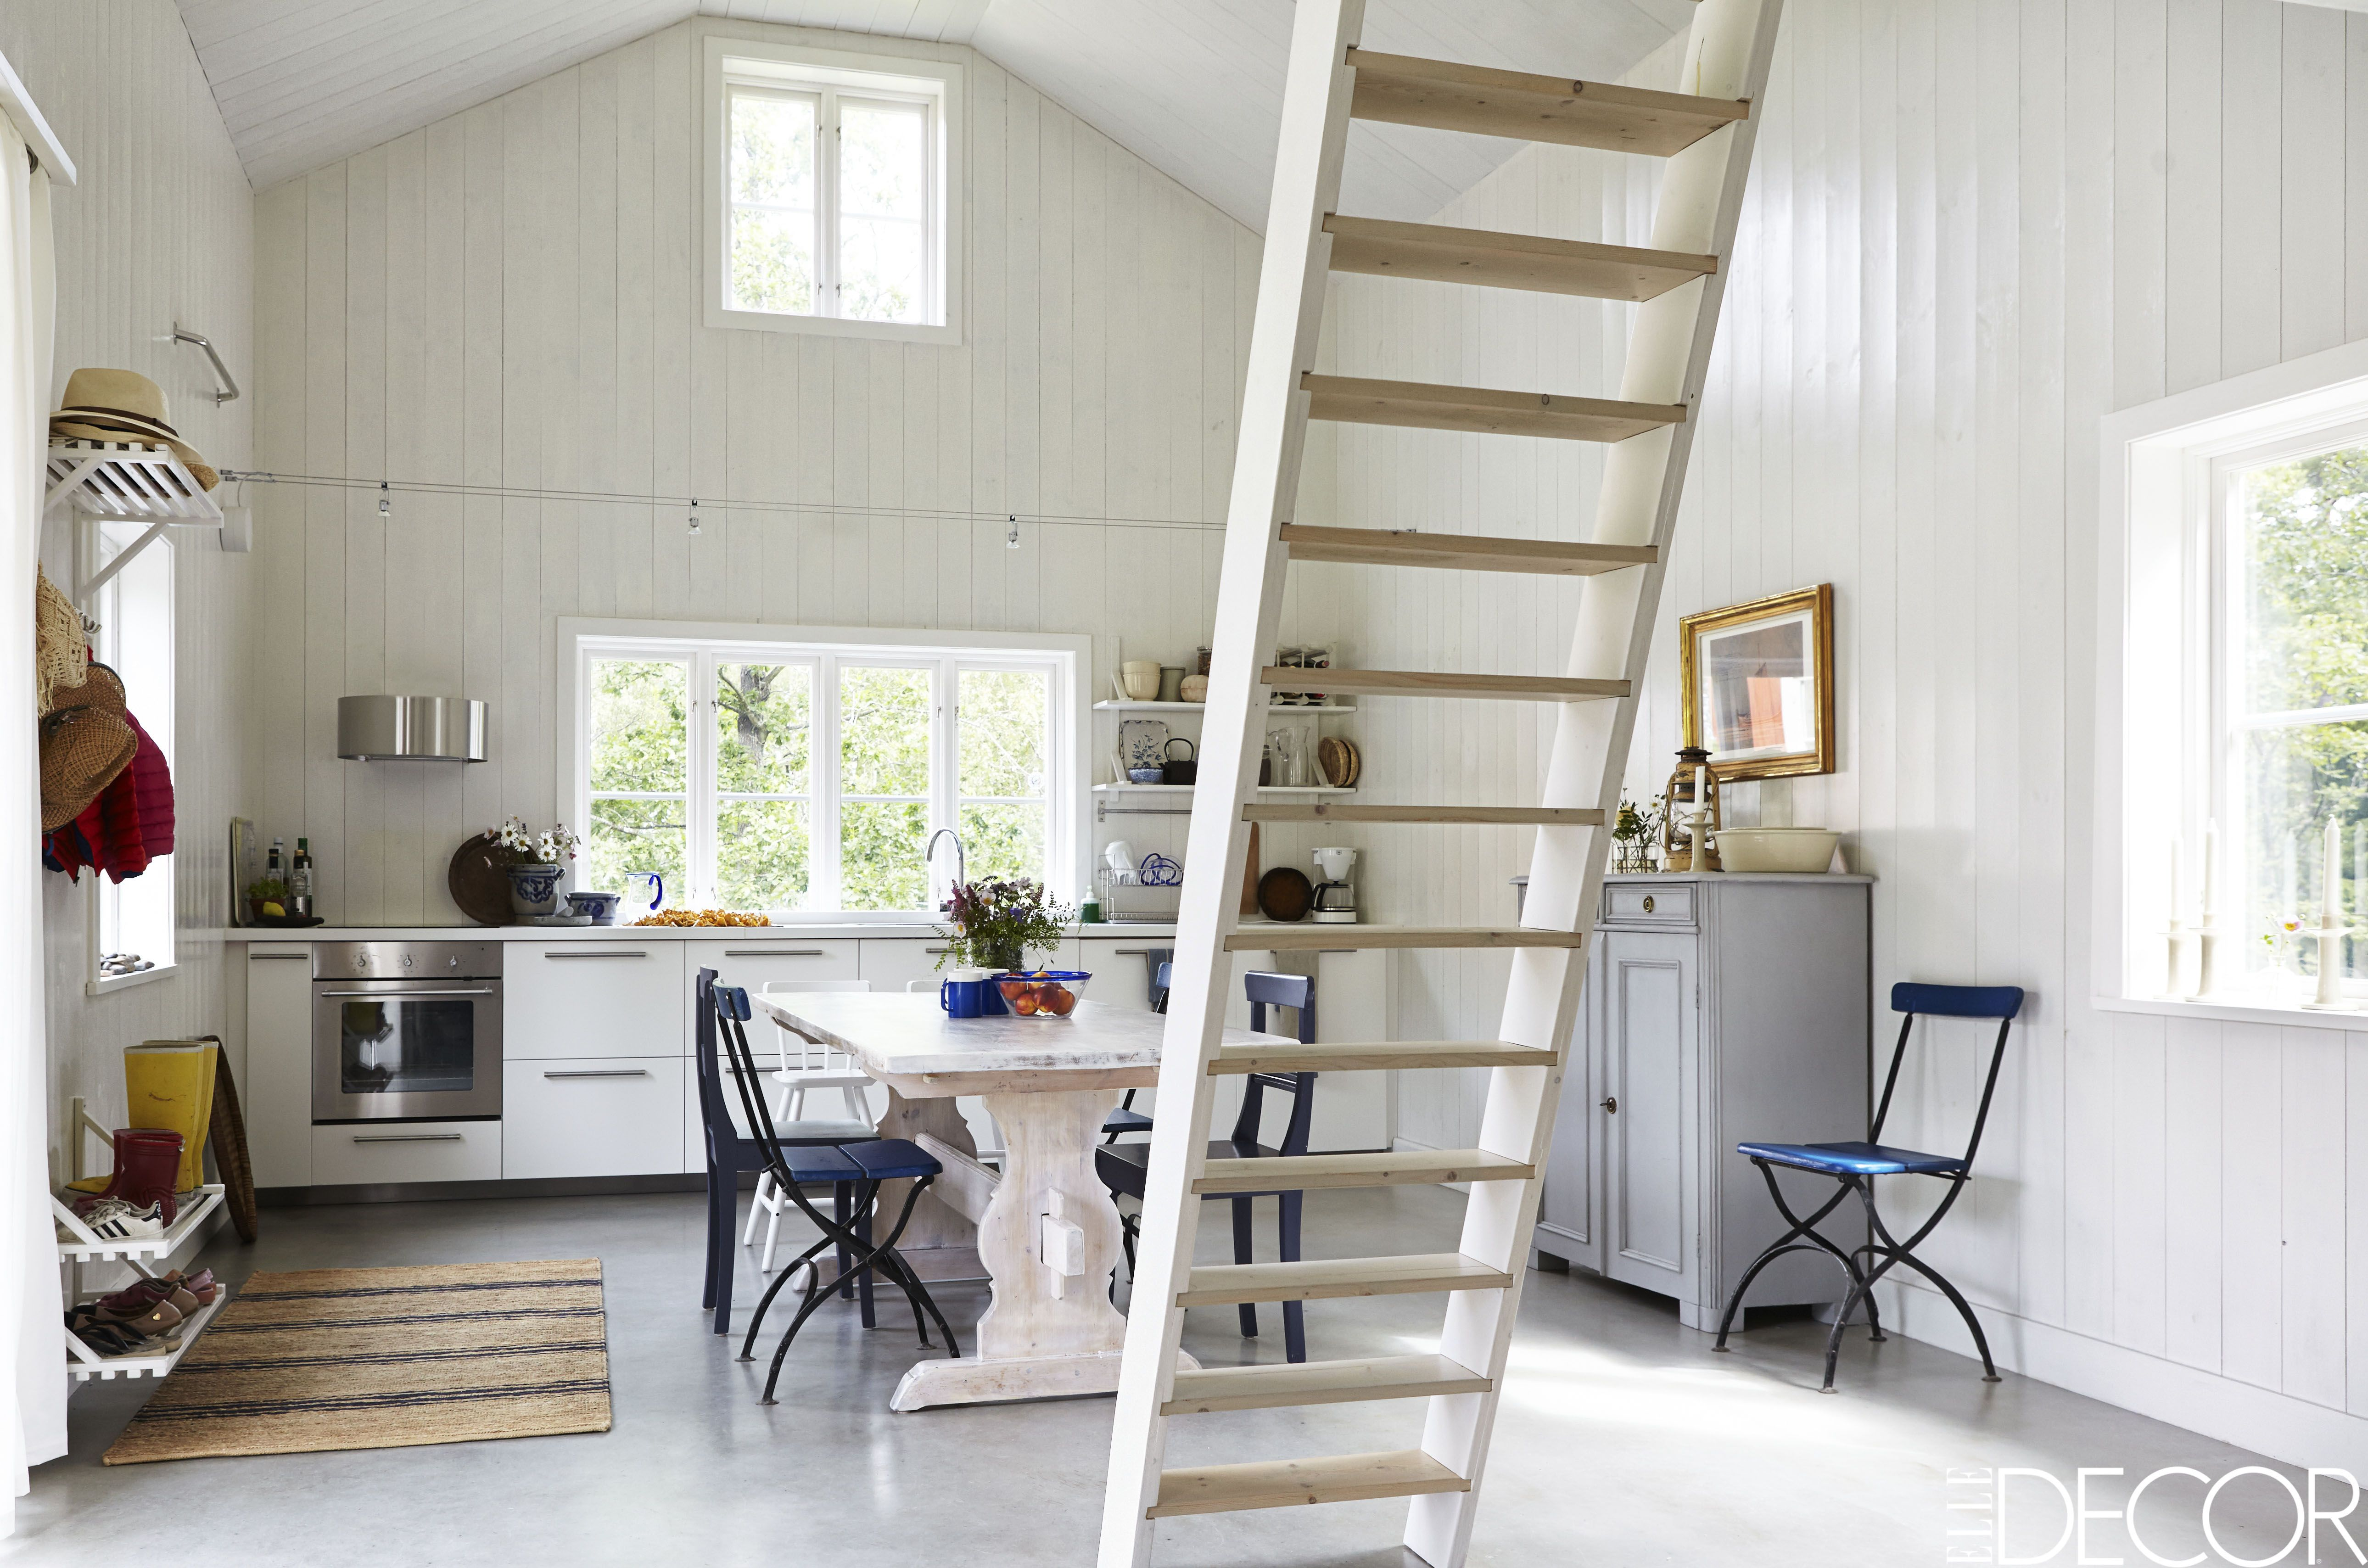 Best Kitchen Gallery: Tour A Minimalist Cottage With Scandinavian Design Summer House In of Swedish Home Design  on rachelxblog.com